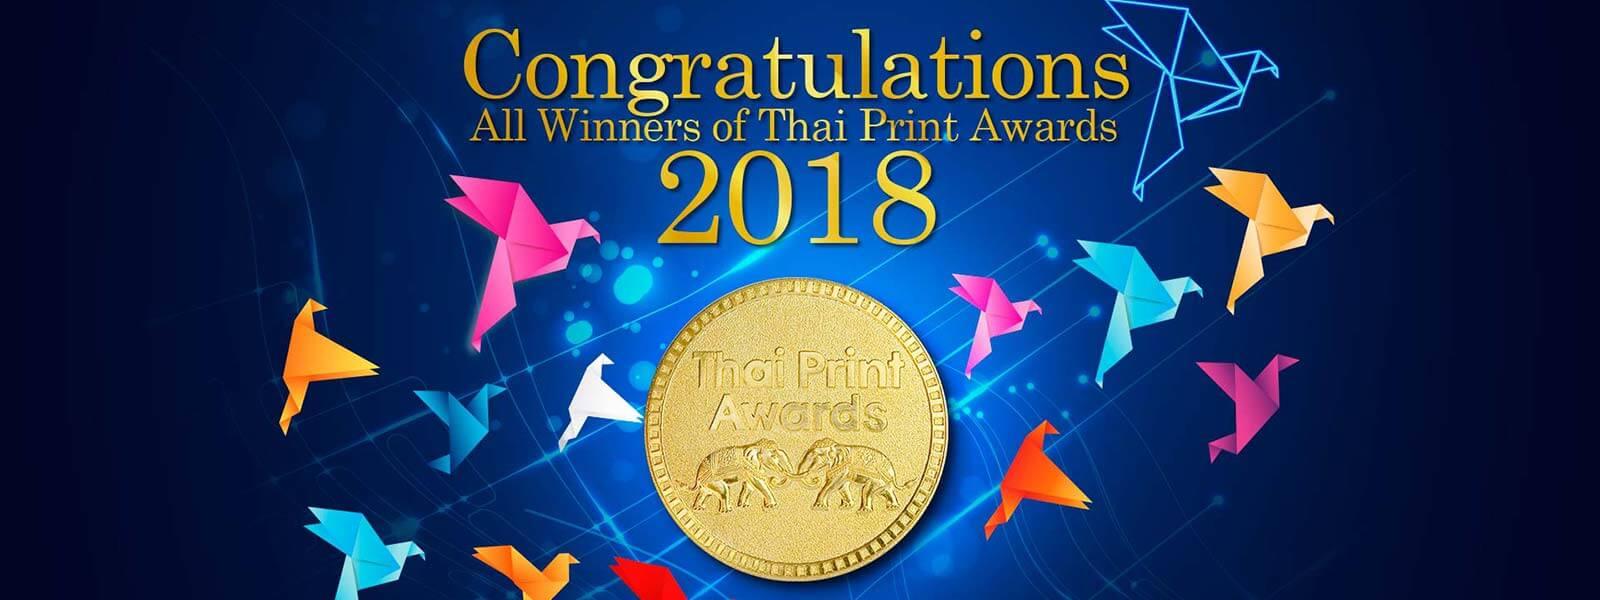 13th Thai Print Awards 2-18